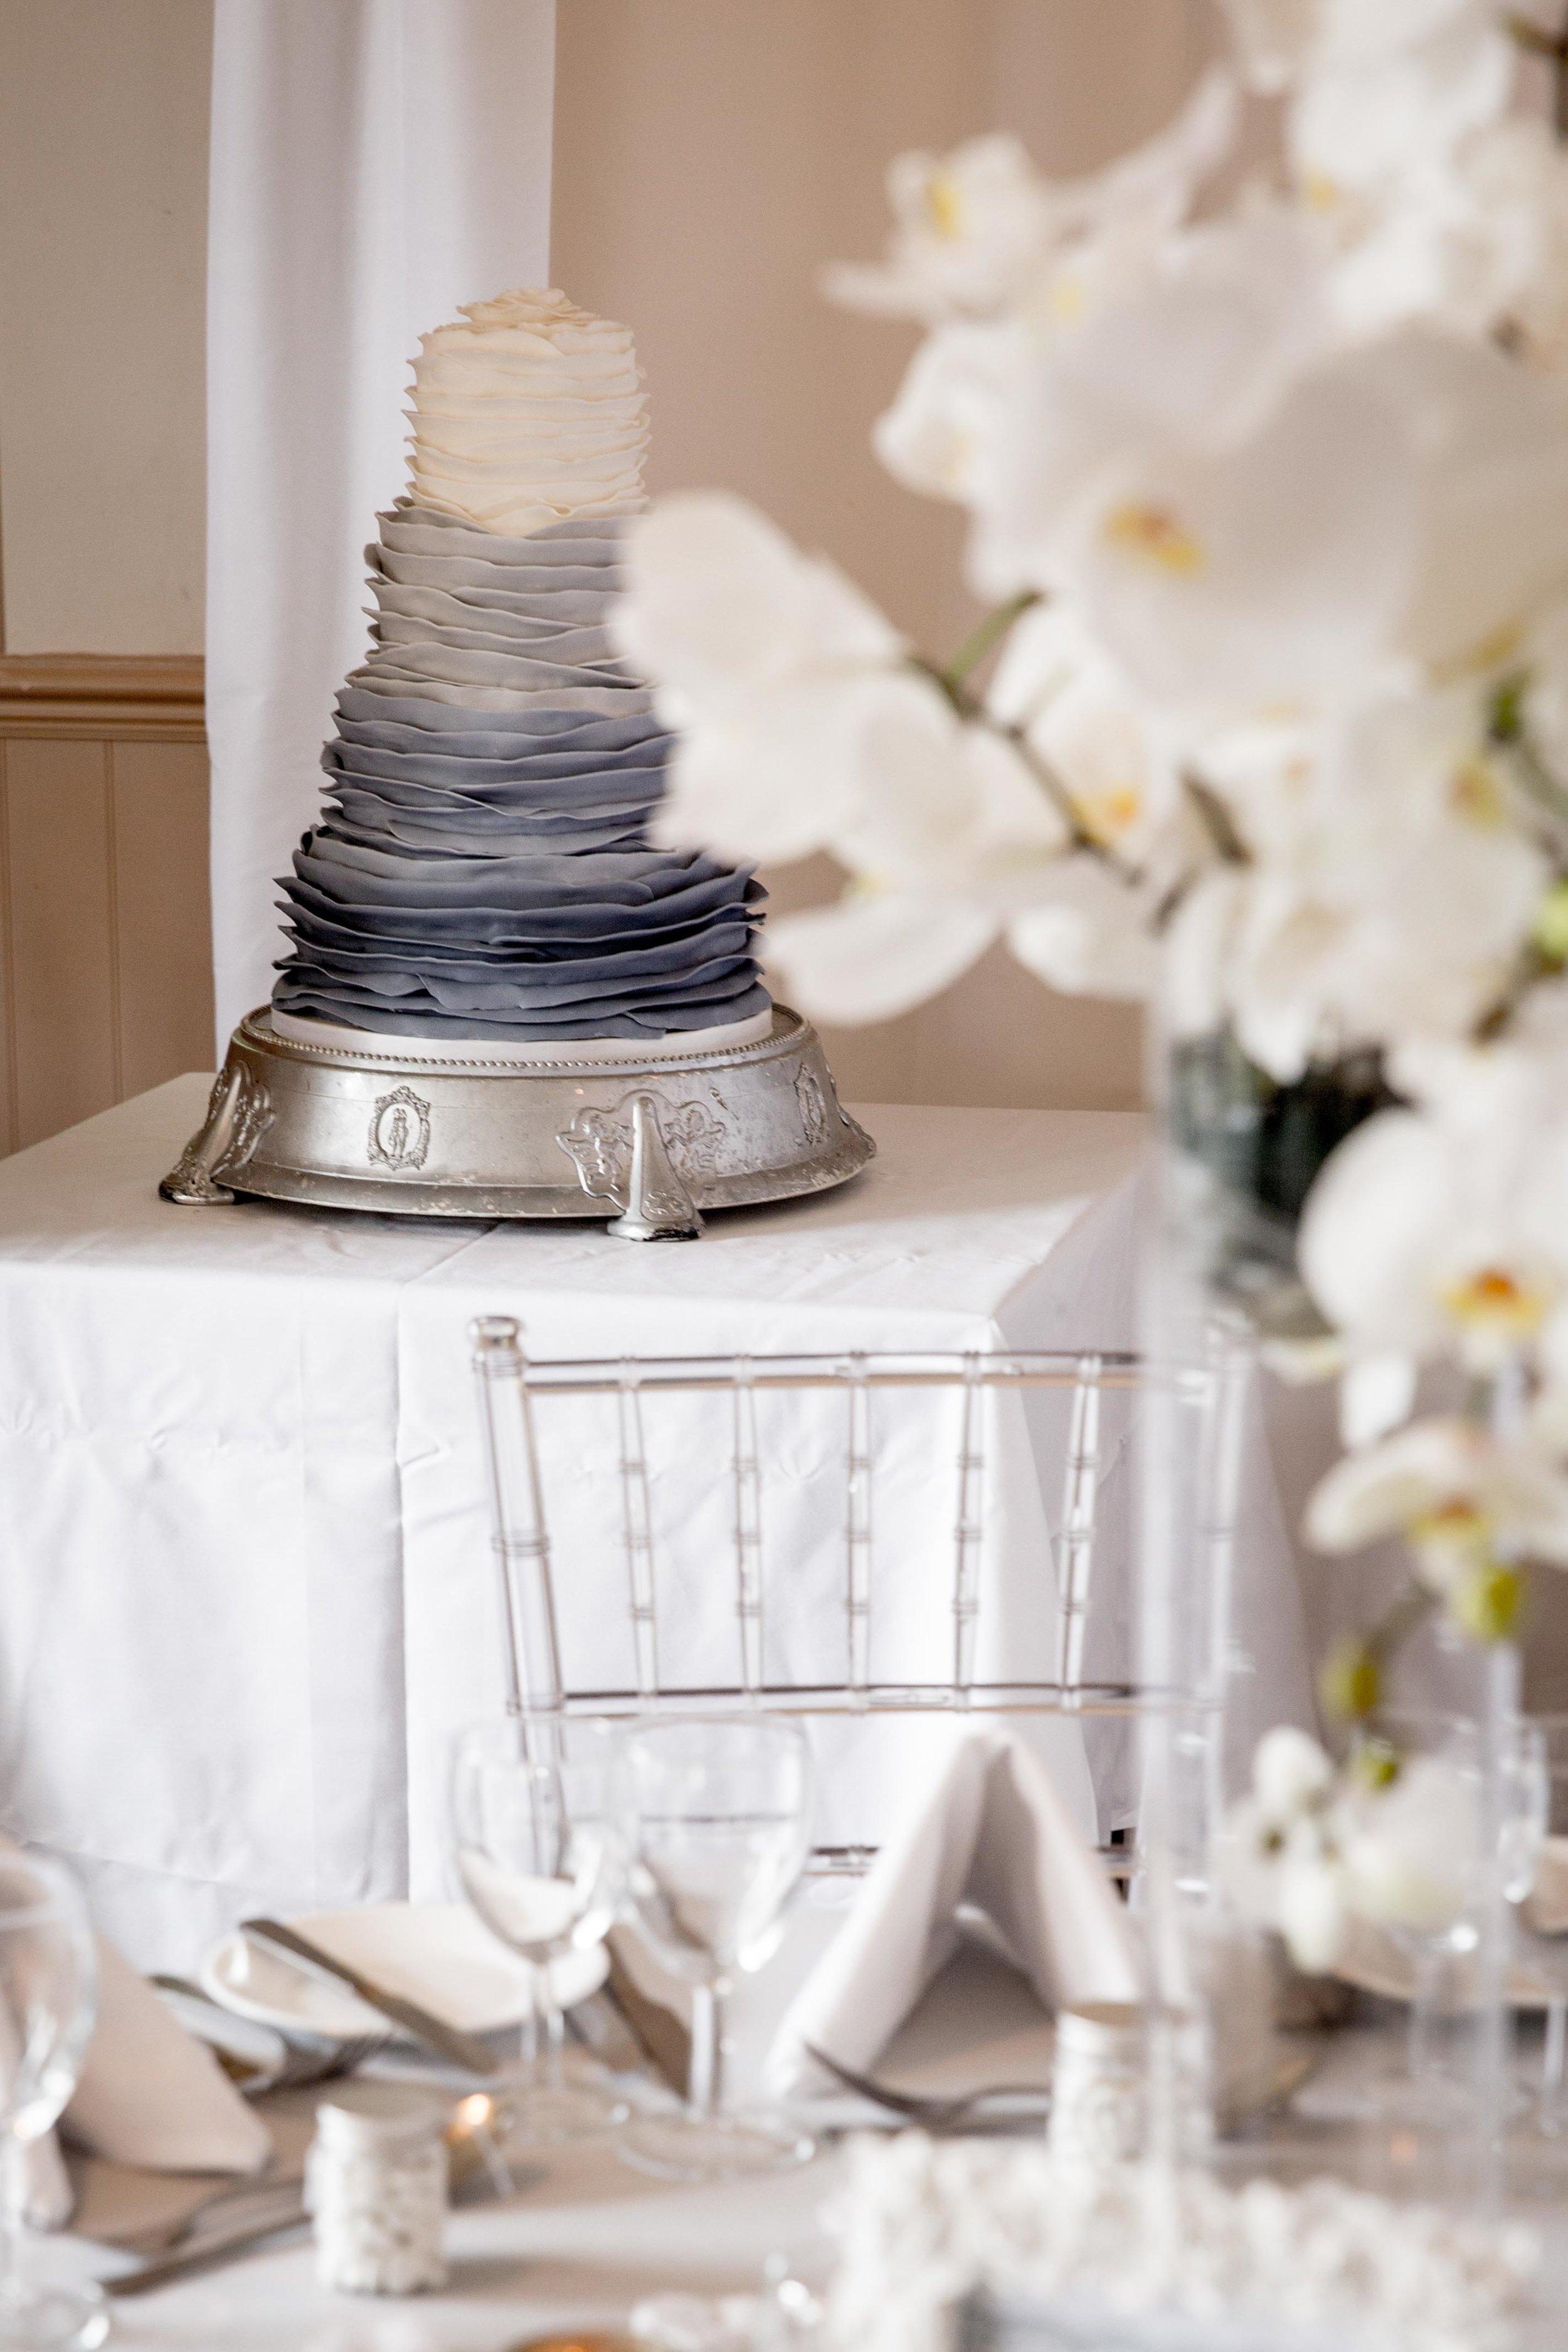 cotswold-wedding-photography-at-stonehouse-court-hotel-natalia-smith-photography-gloucestershire-wedding-photographer-73.jpg